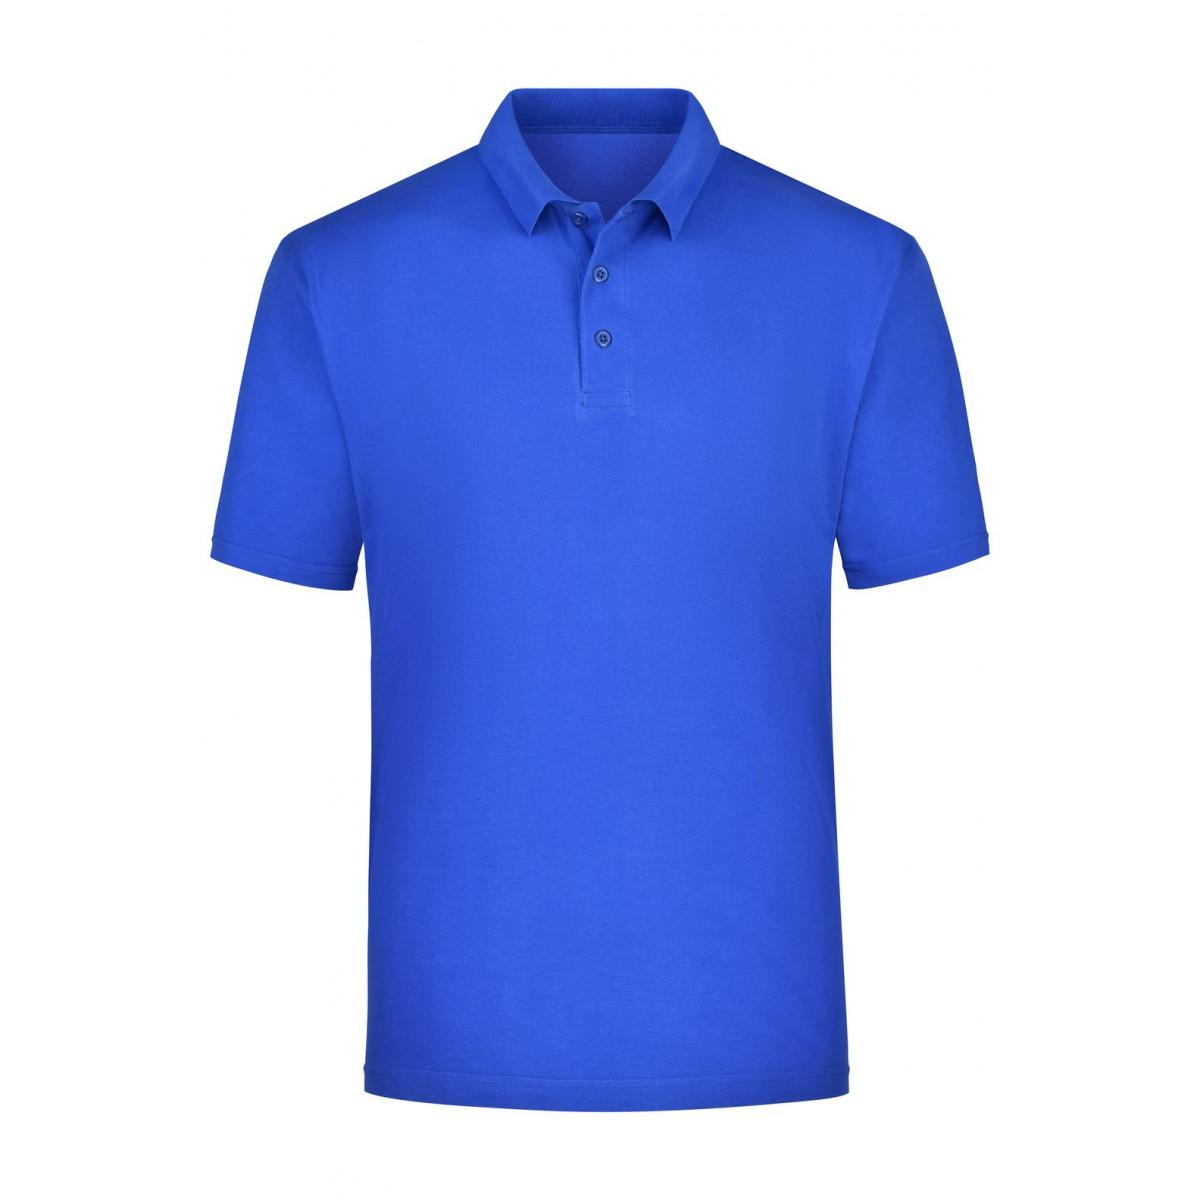 Рубашка поло мужская JN021 Polo Piqué Heavy - Ярко-синий